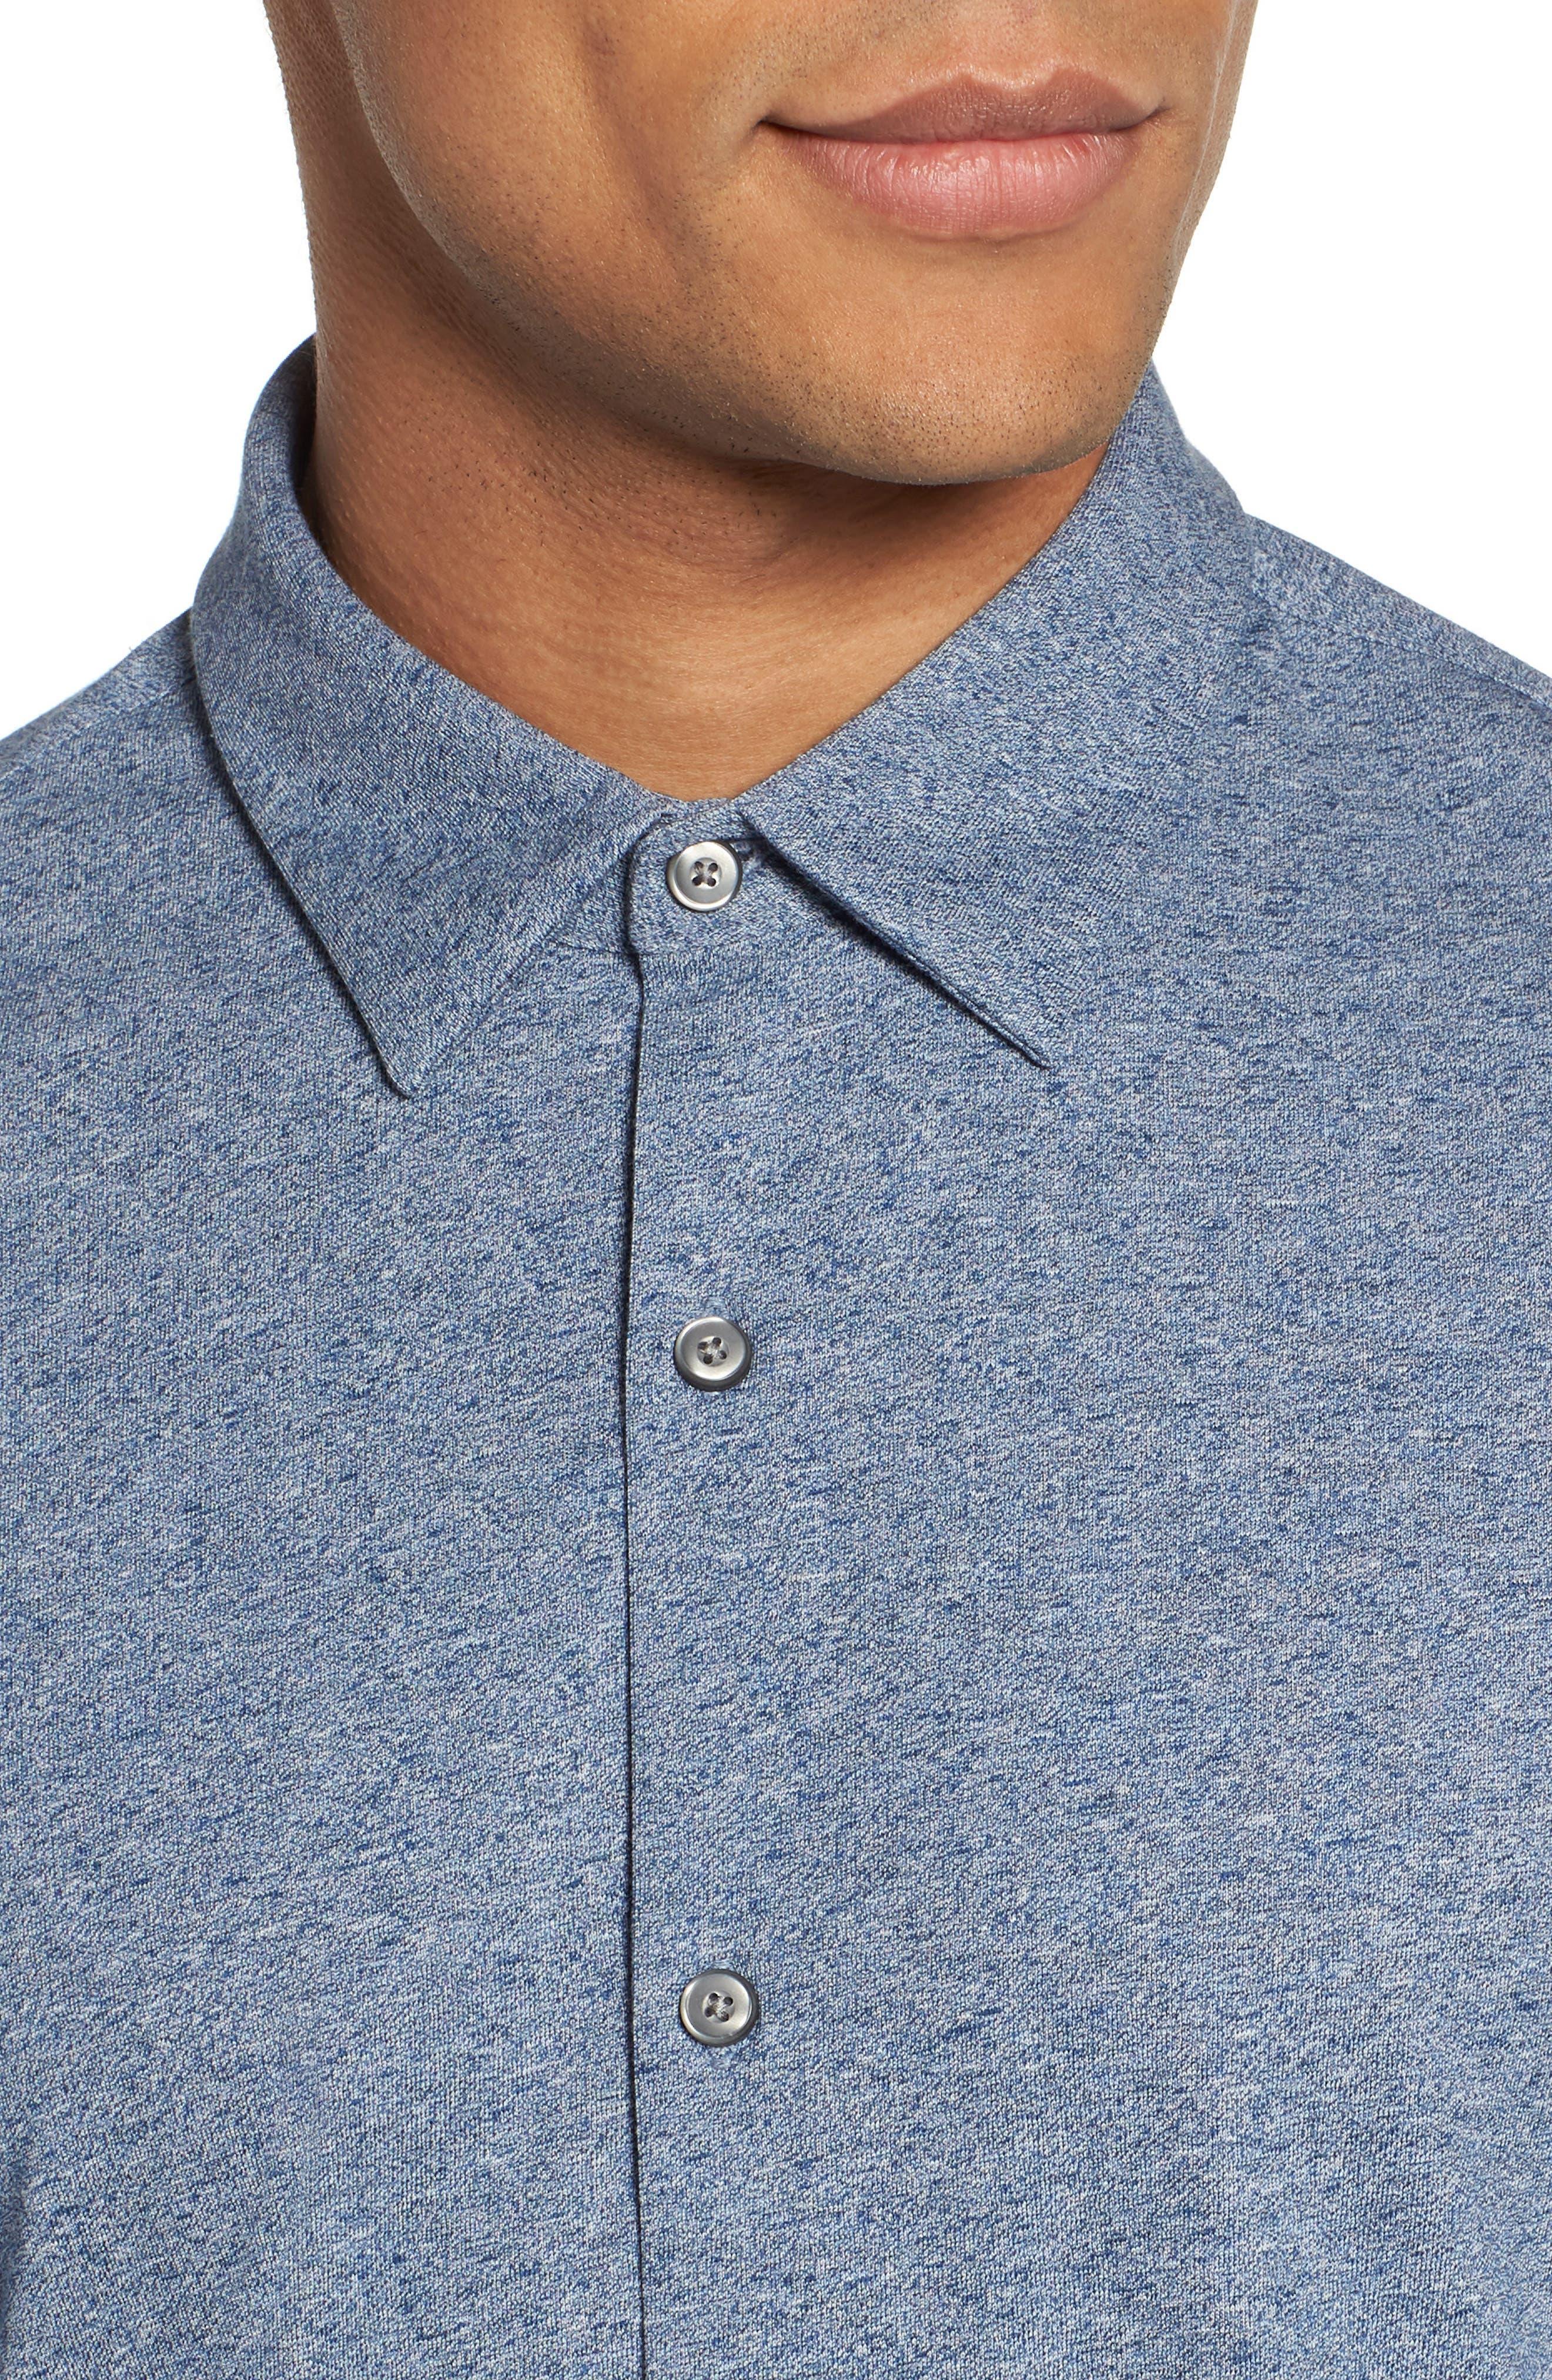 Knit Sport Shirt,                             Alternate thumbnail 8, color,